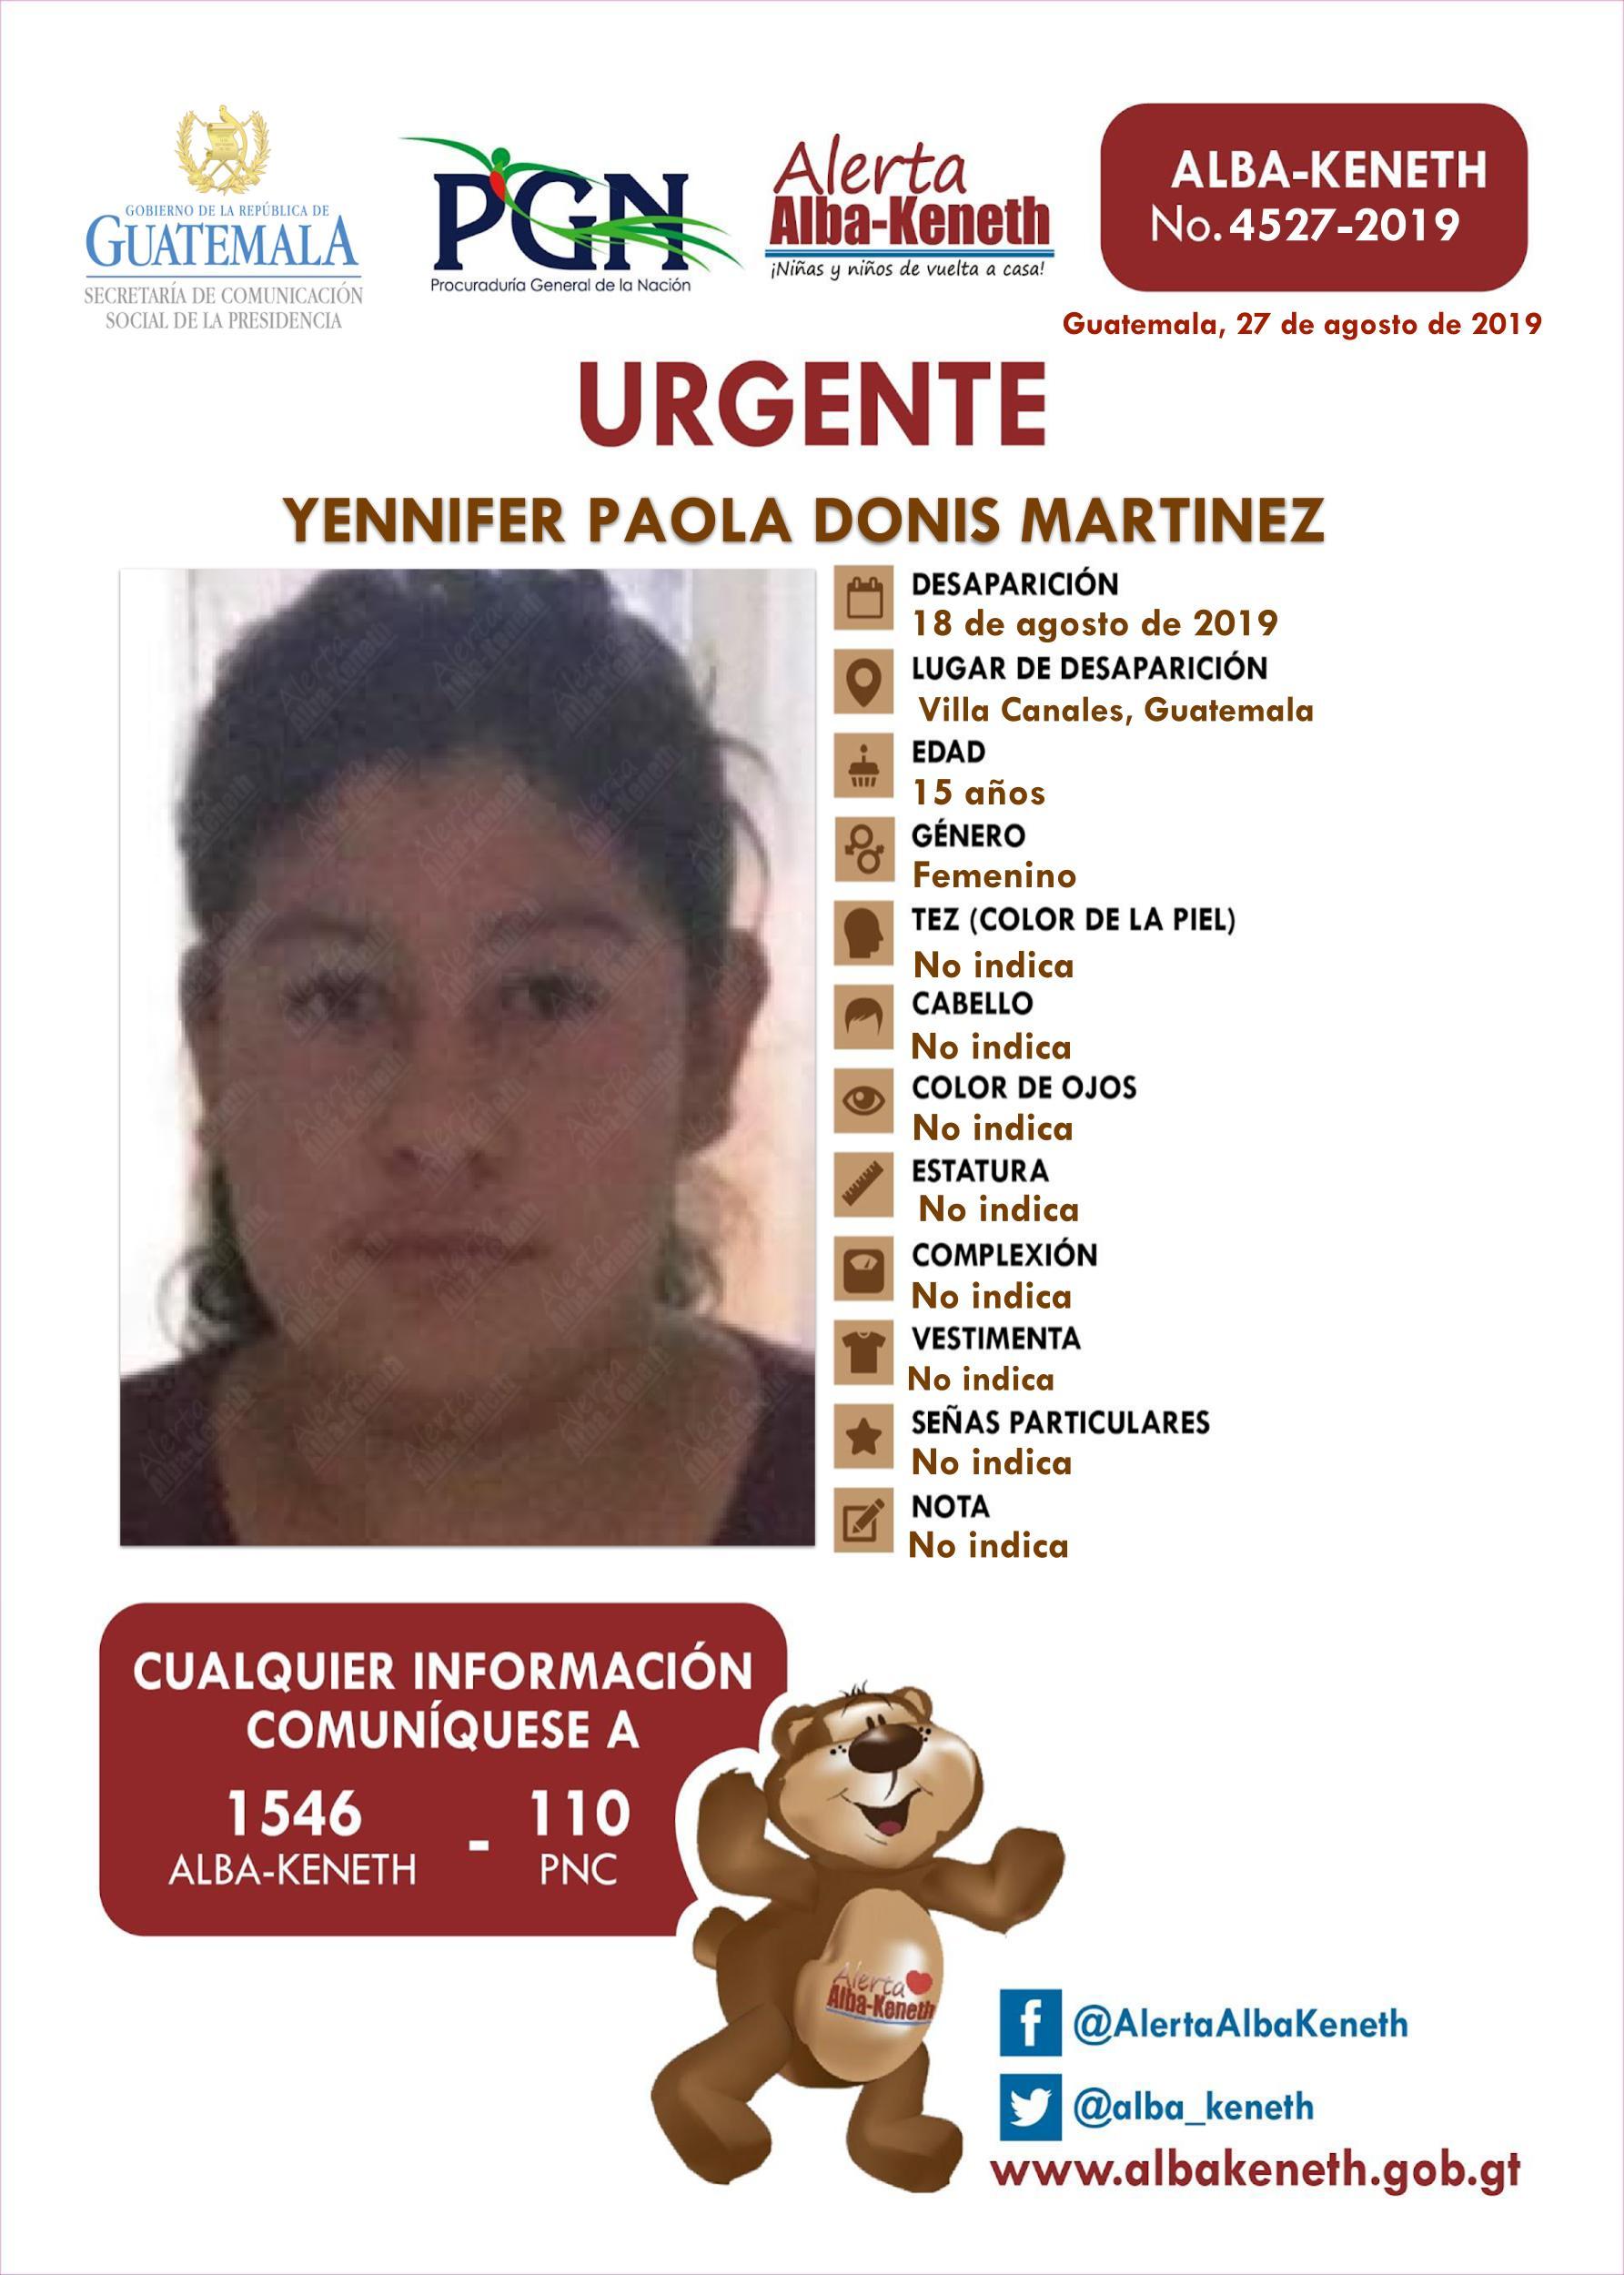 Yennifer Paola Donis Martinez